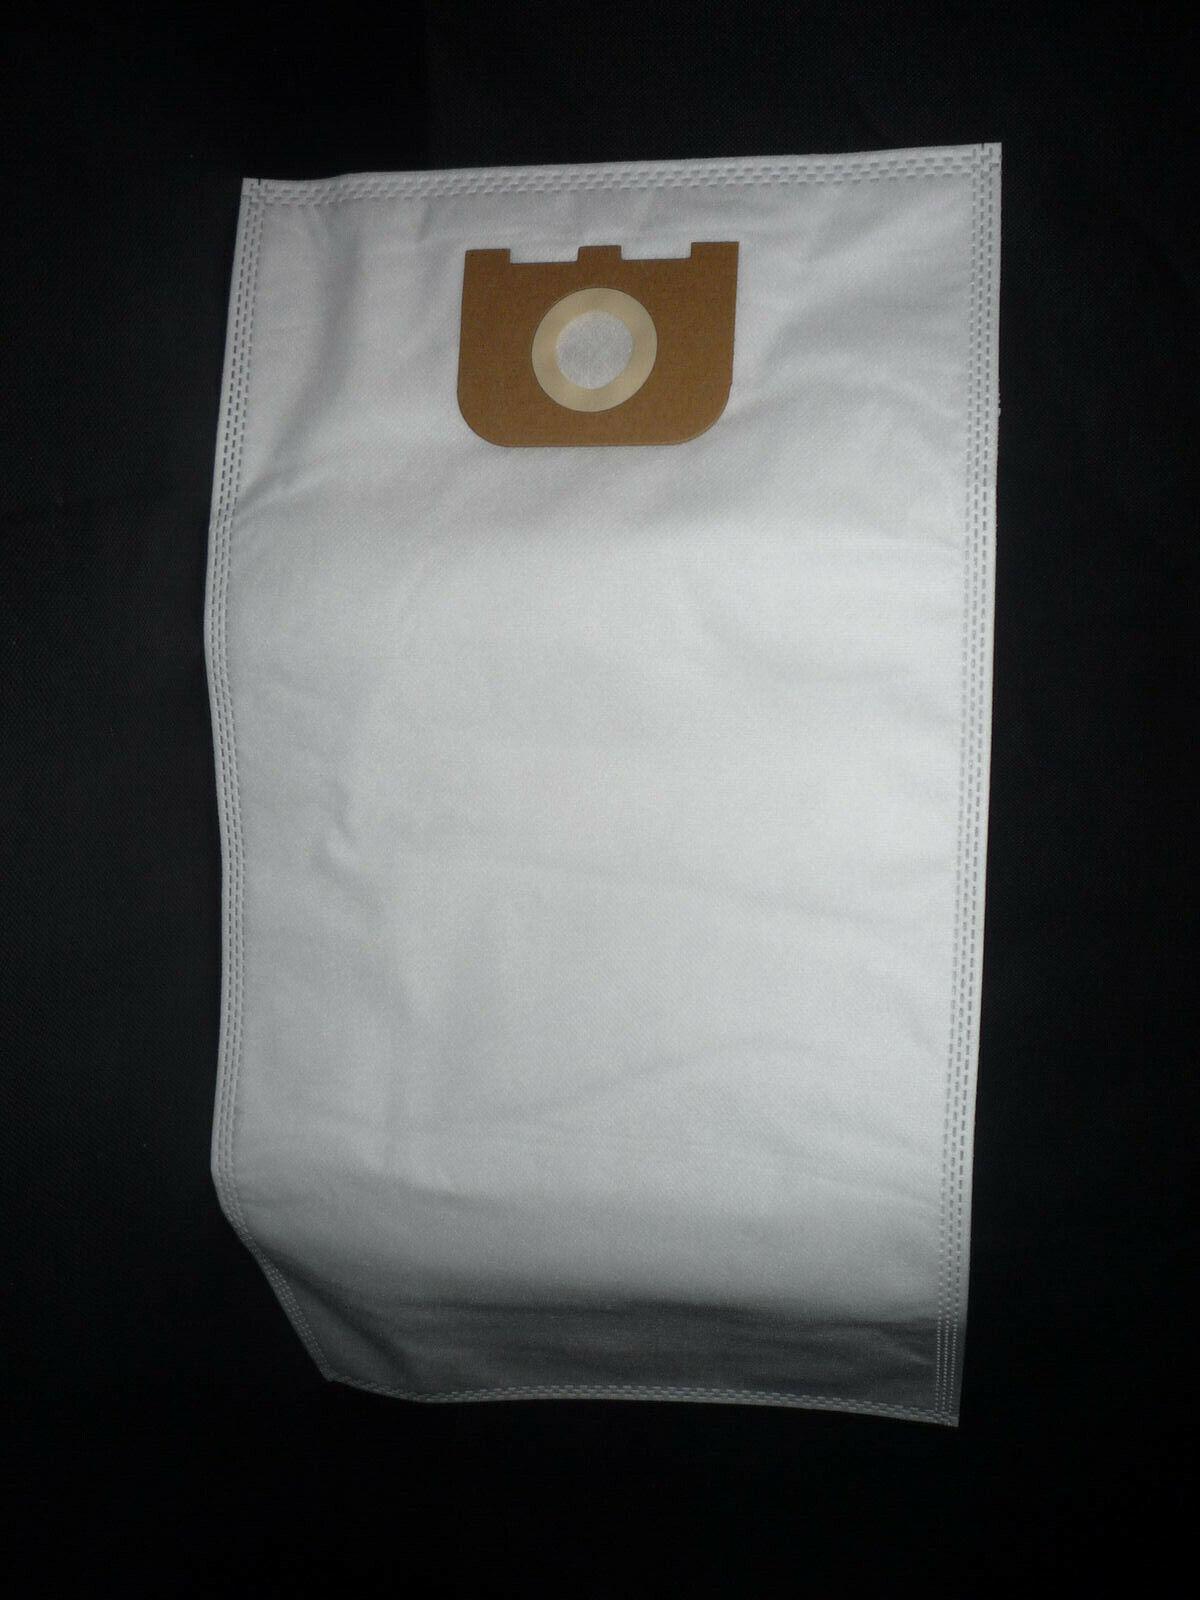 5x SCM Staubsaugerbeutel geeignet Scheppach ASP50-ES Nass-Trocken